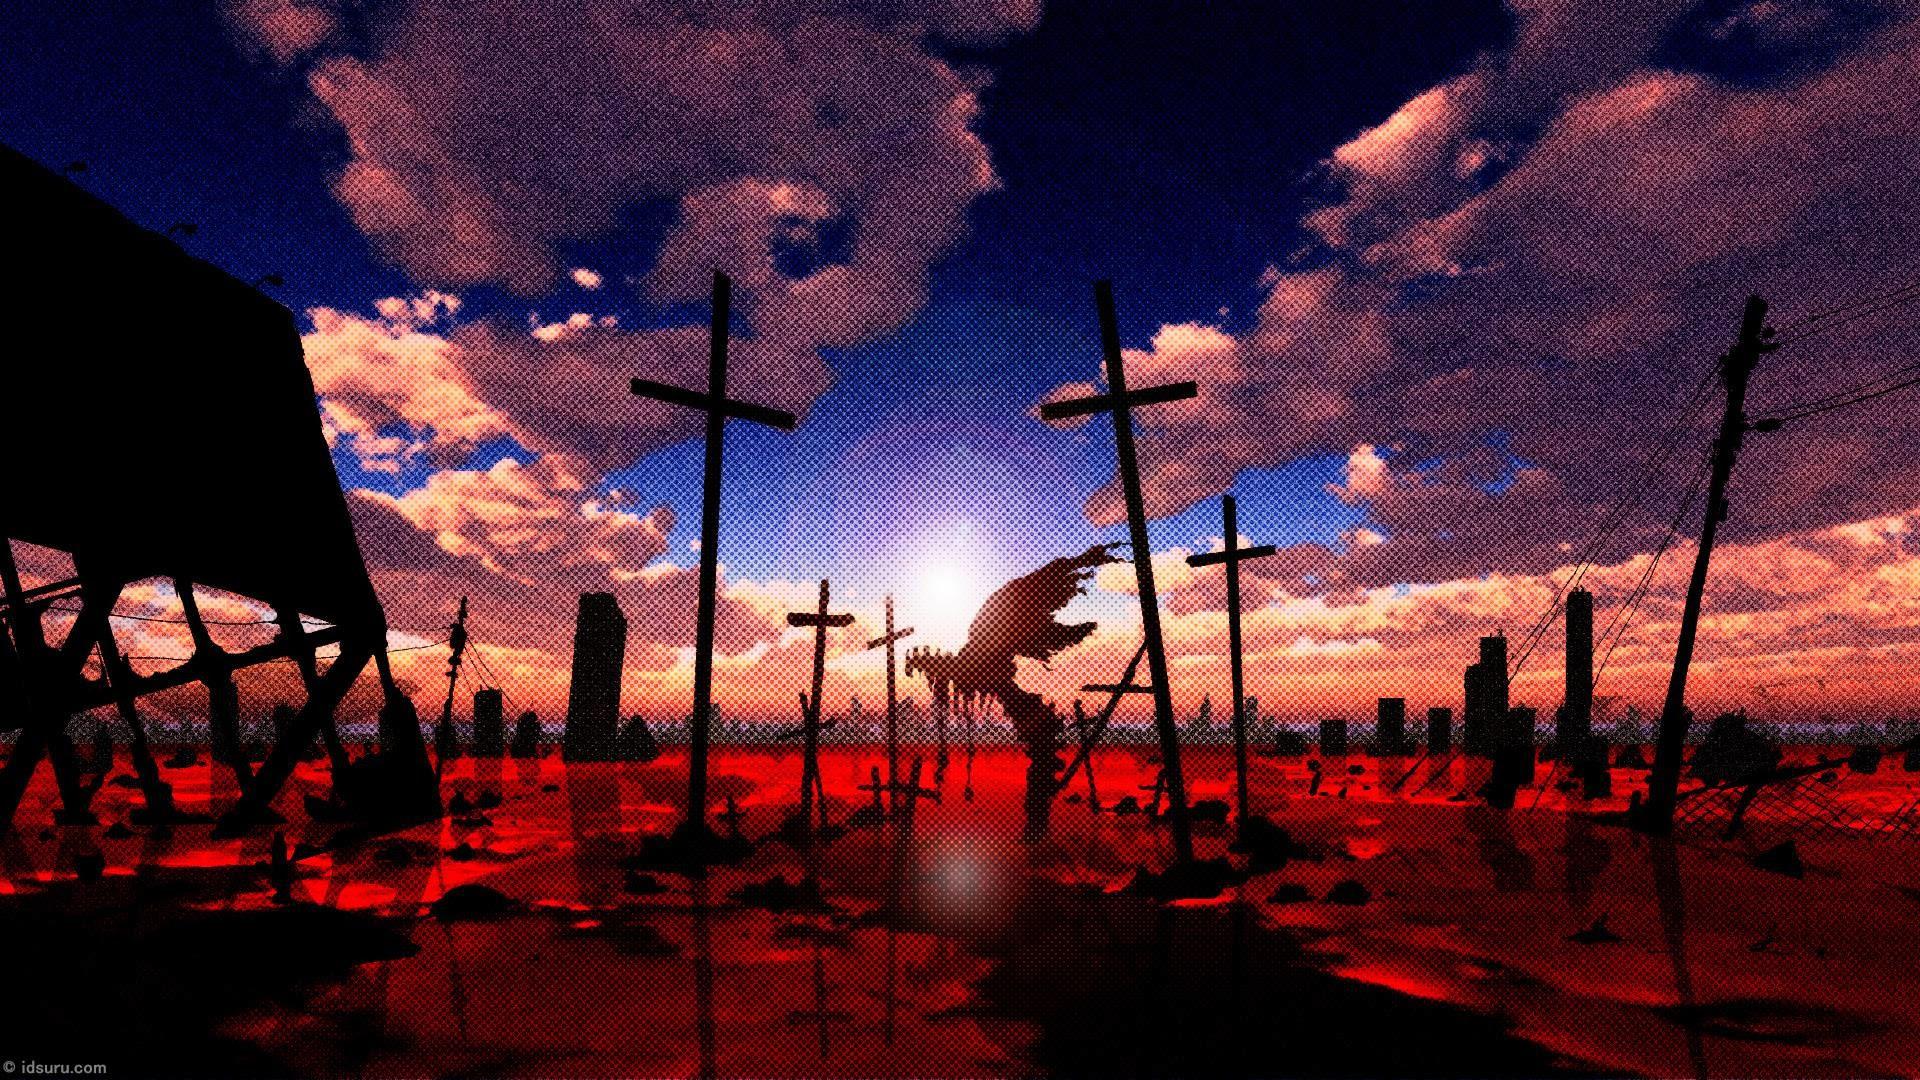 Neon Genesis Evangelion Wallpaper Hd 71 Images